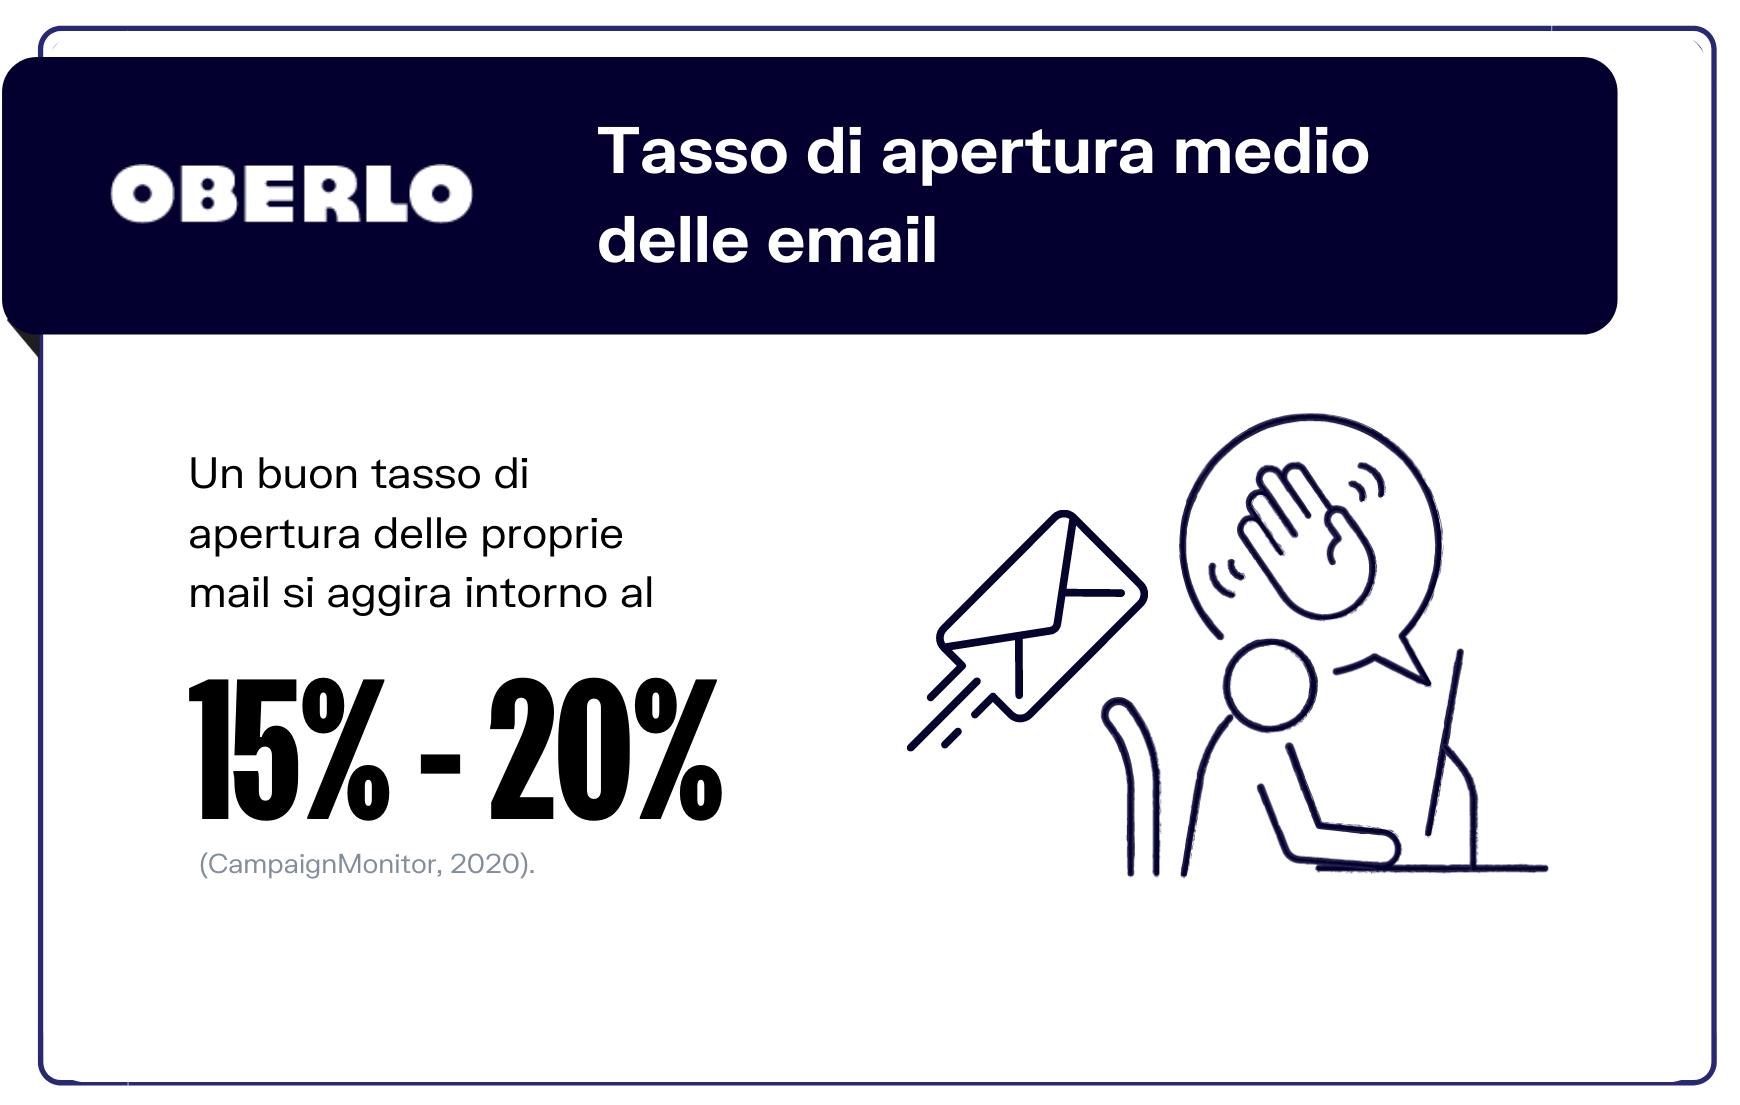 tasso di apertura email medio